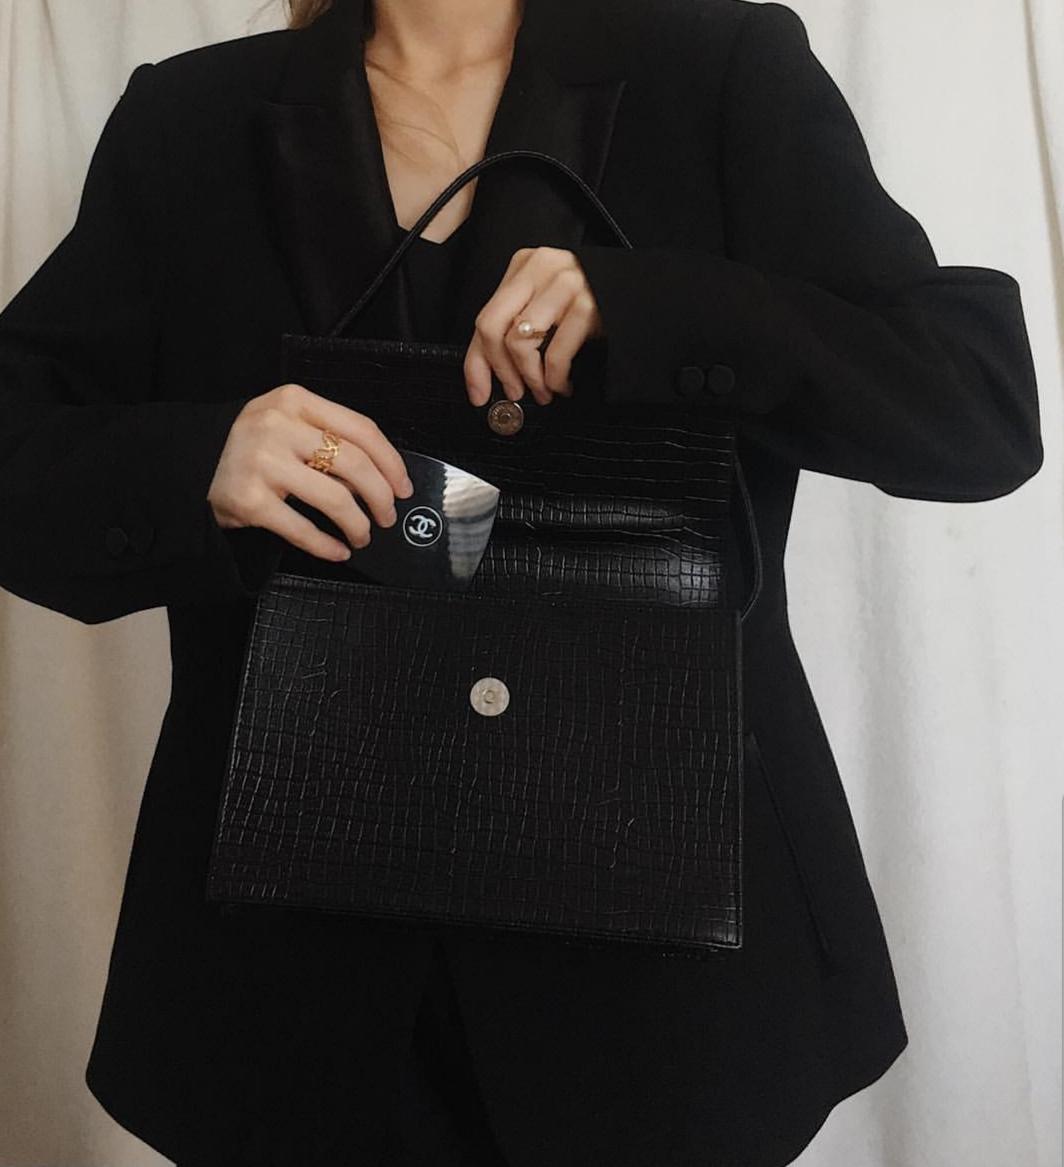 @lisa.villemaire - Wearing Diploria Signature Ring.